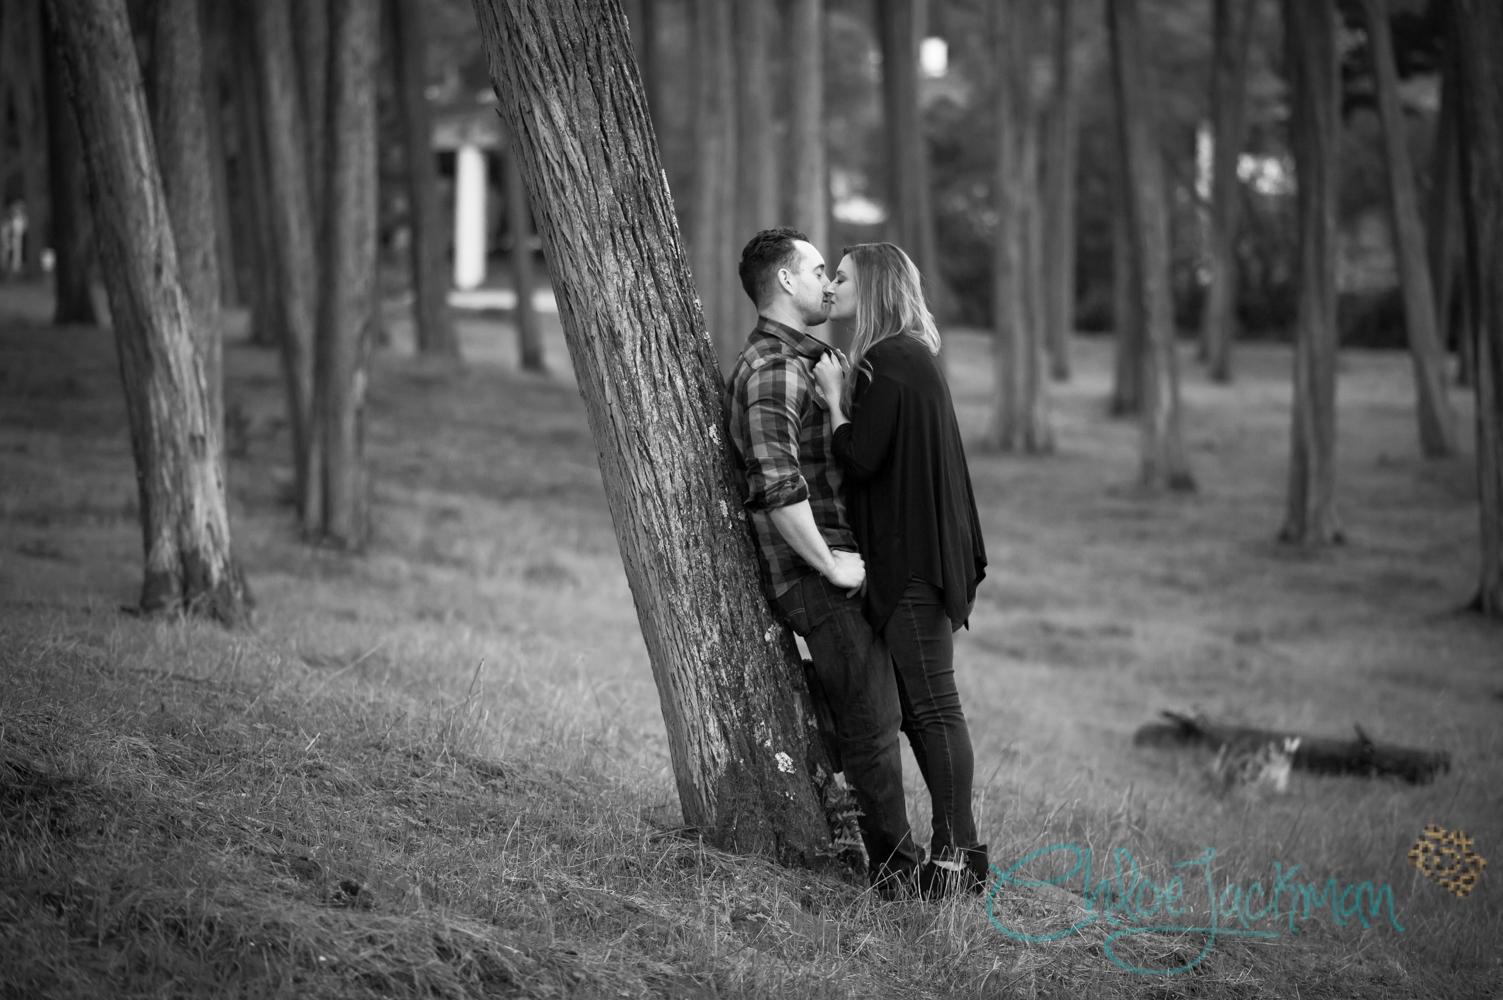 Chloe-Jackman-Photography-Golden-Gate-Park-Engagement-Session-2014-165